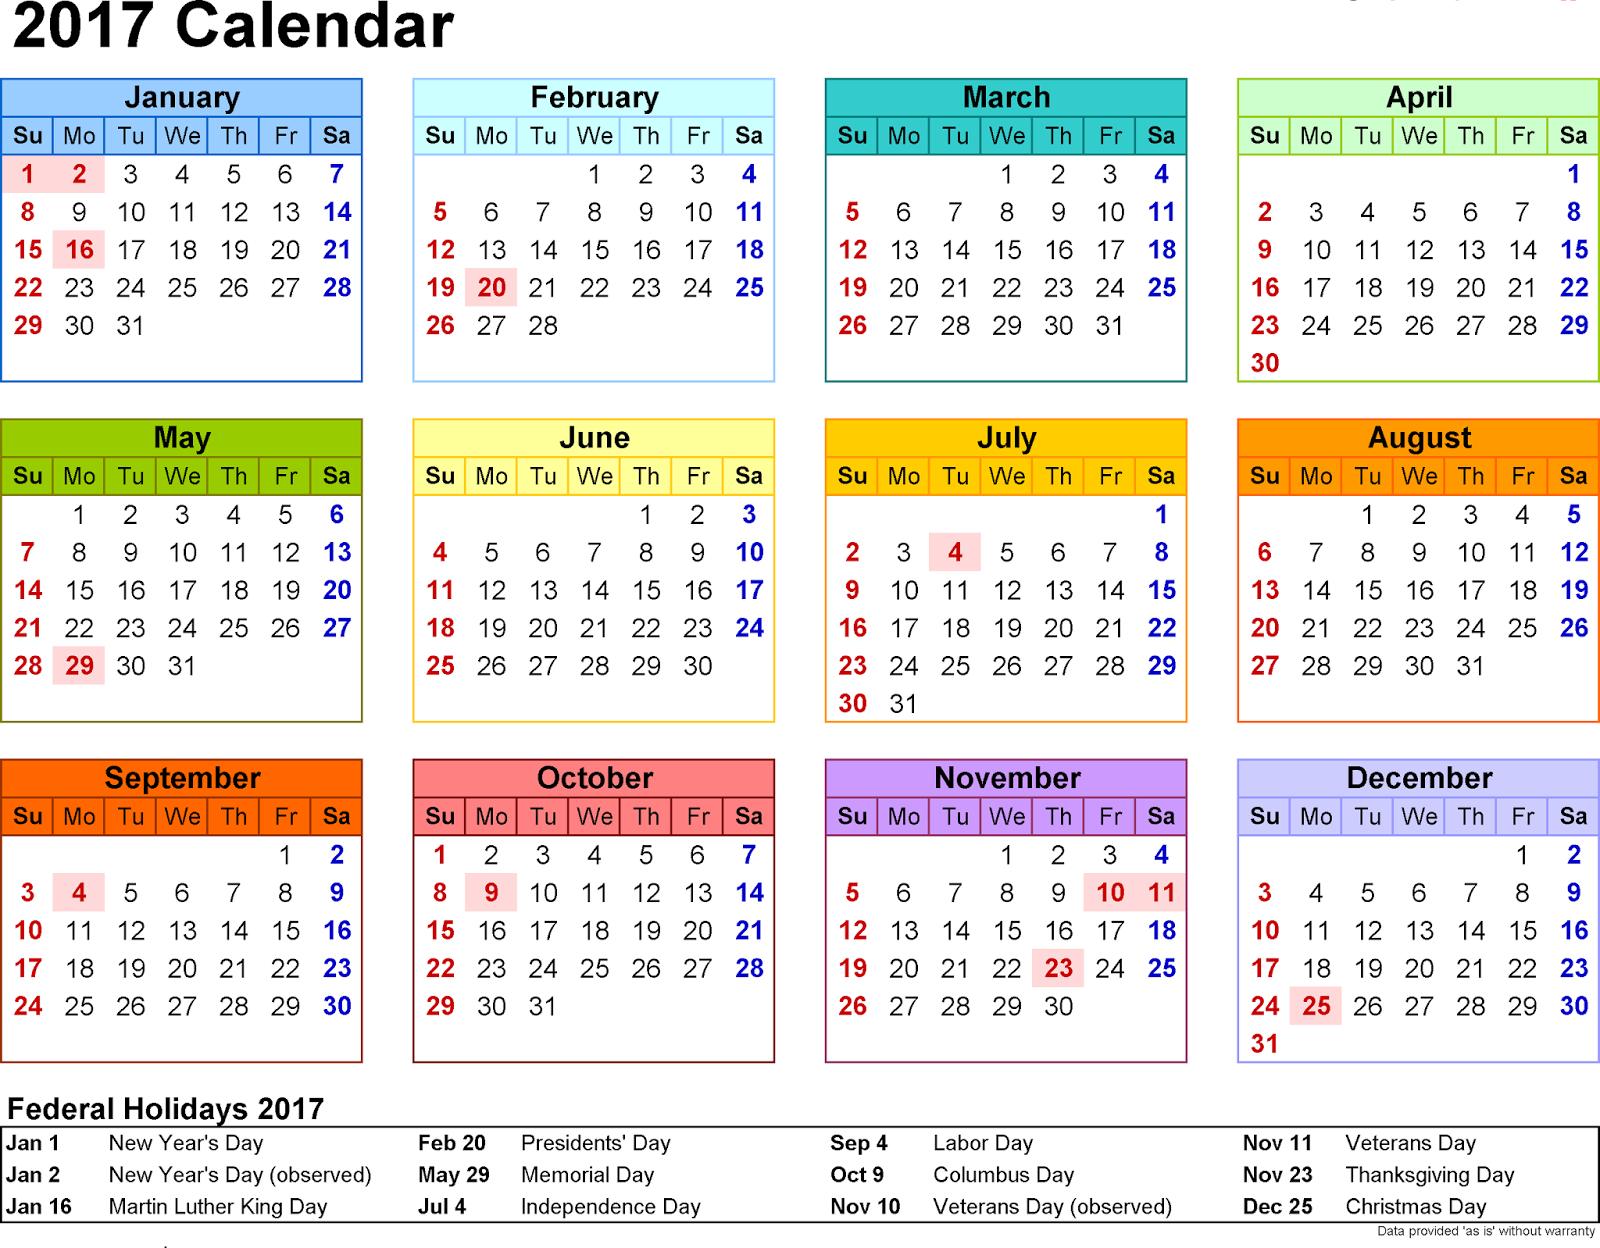 Islamic Calendar 2017 with Muslim Holidays